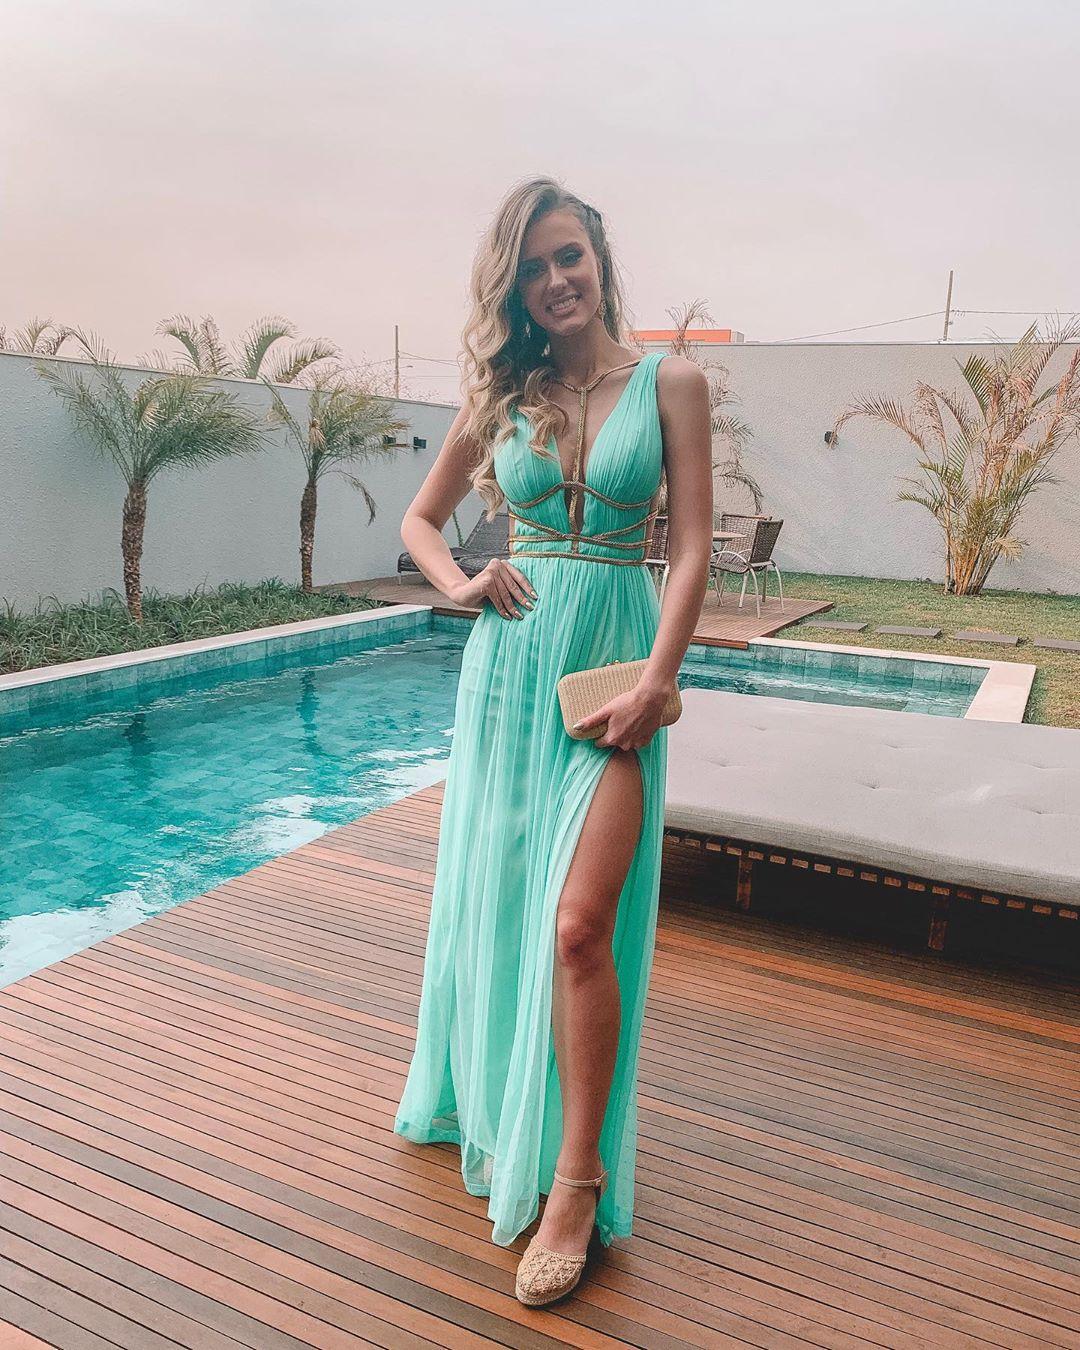 marcella kozinski de barros, 3rd runner-up de miss tourism world 2019. 66773210